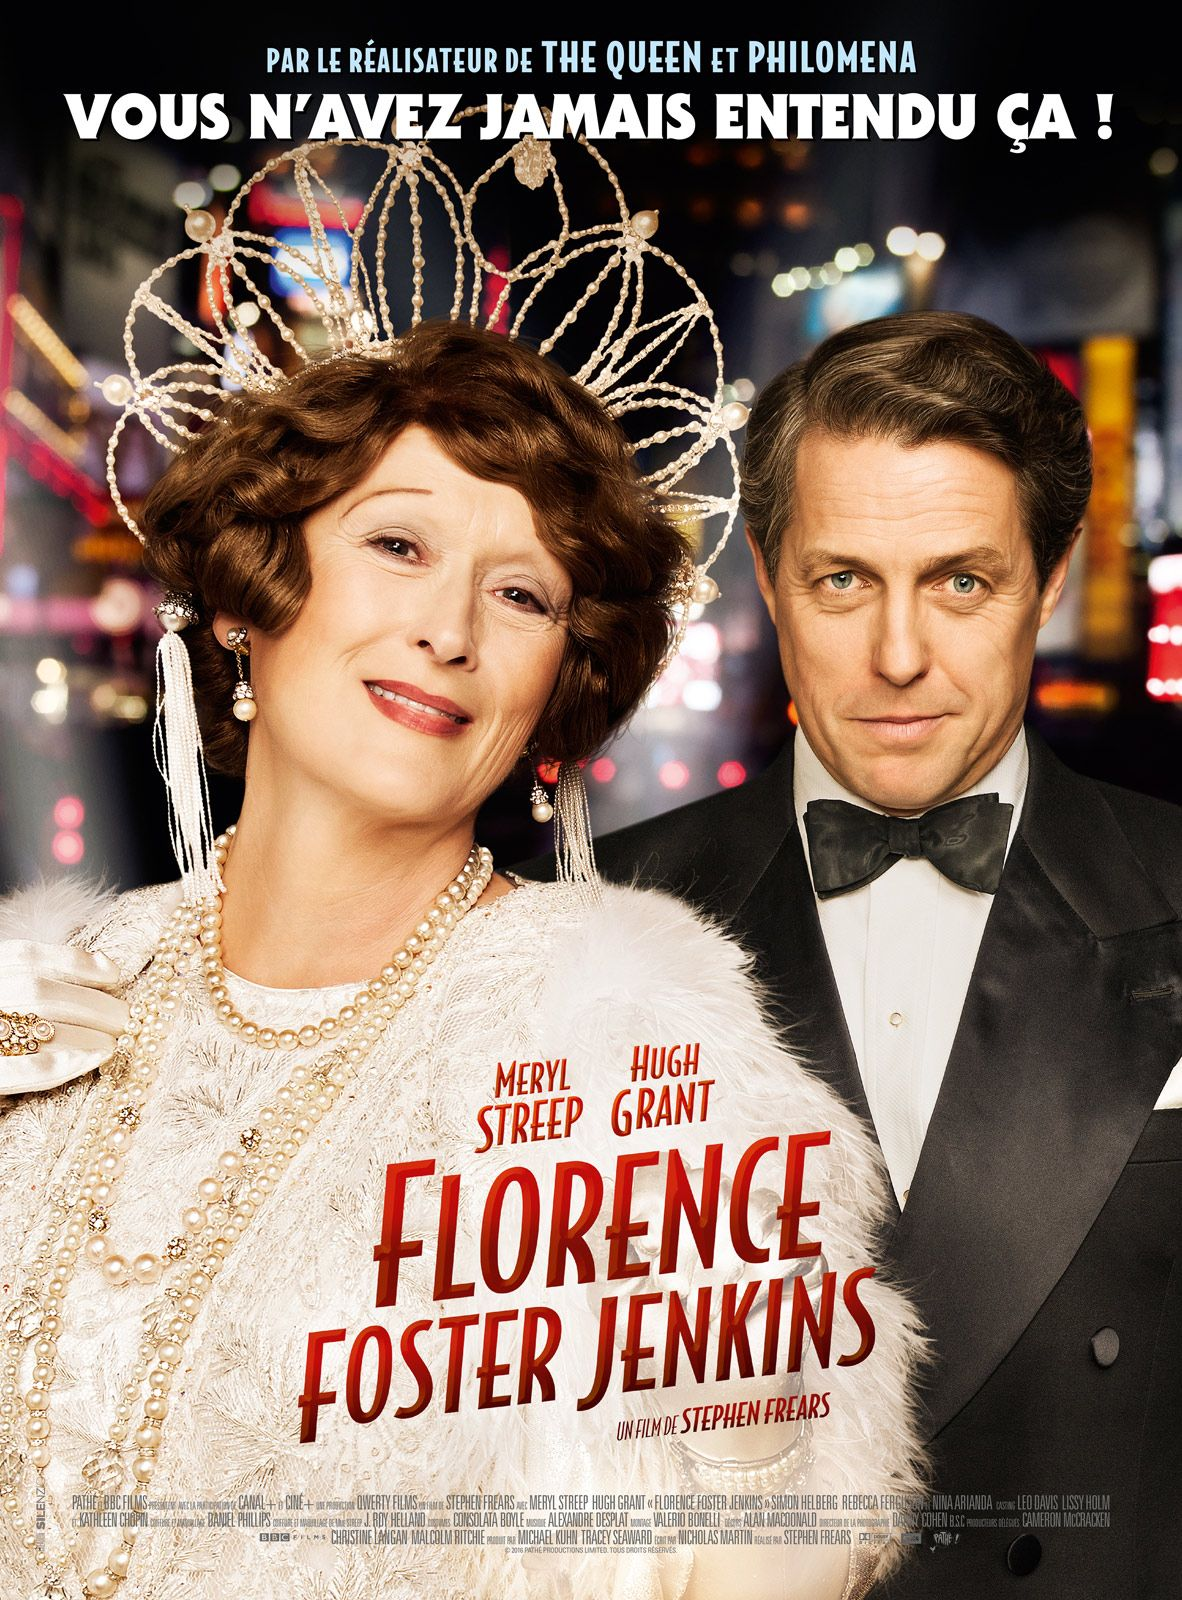 Florence Foster Jenkins (Film)